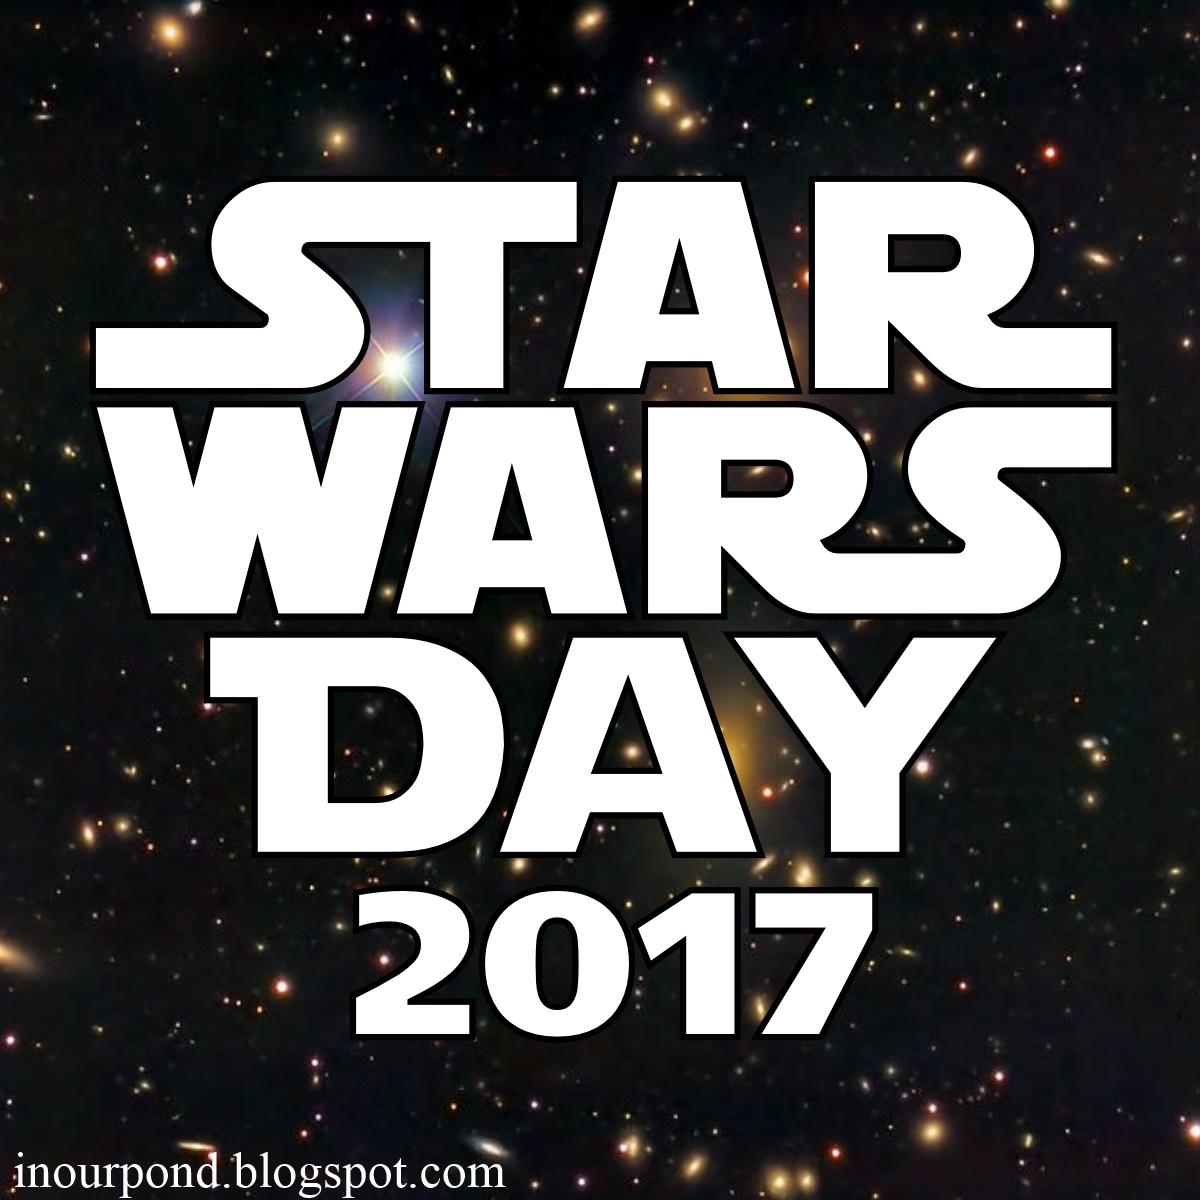 Star Wars Day: Star Wars Day 2017